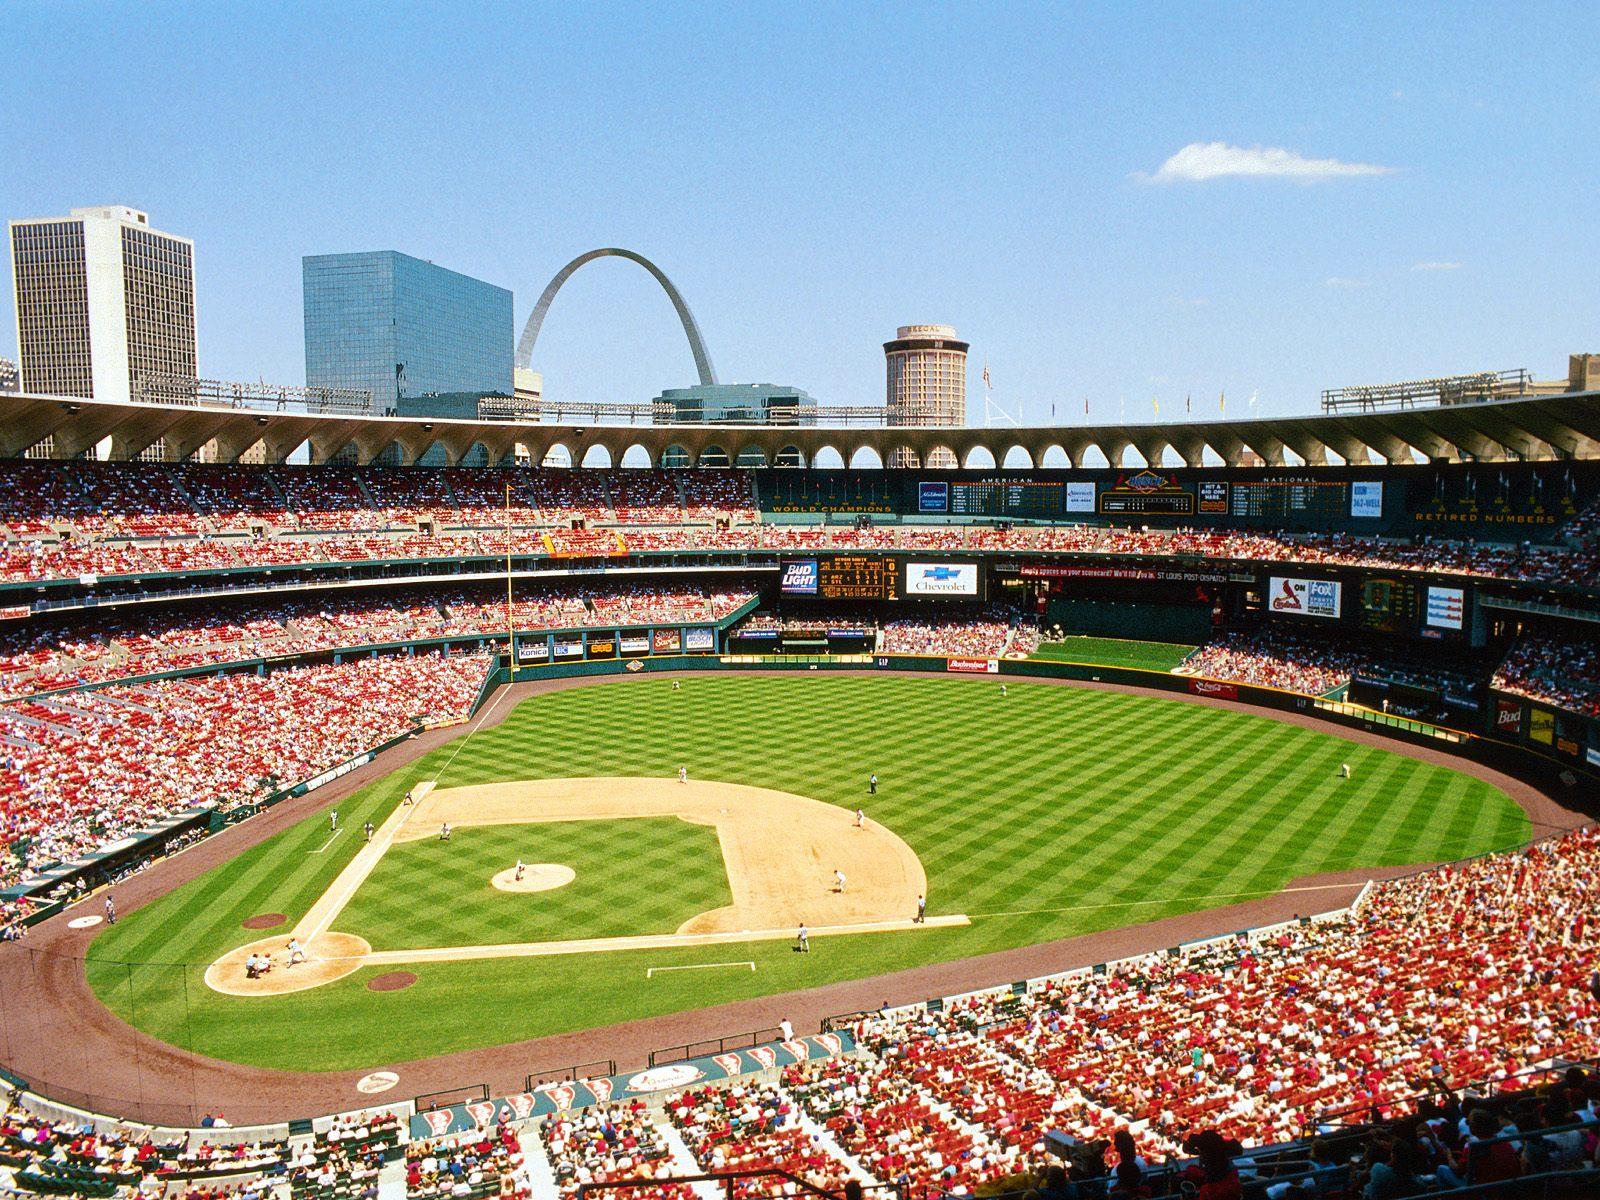 Busch Stadium St Louis Missouri   Sports Wallpaper Image featuring 1600x1200